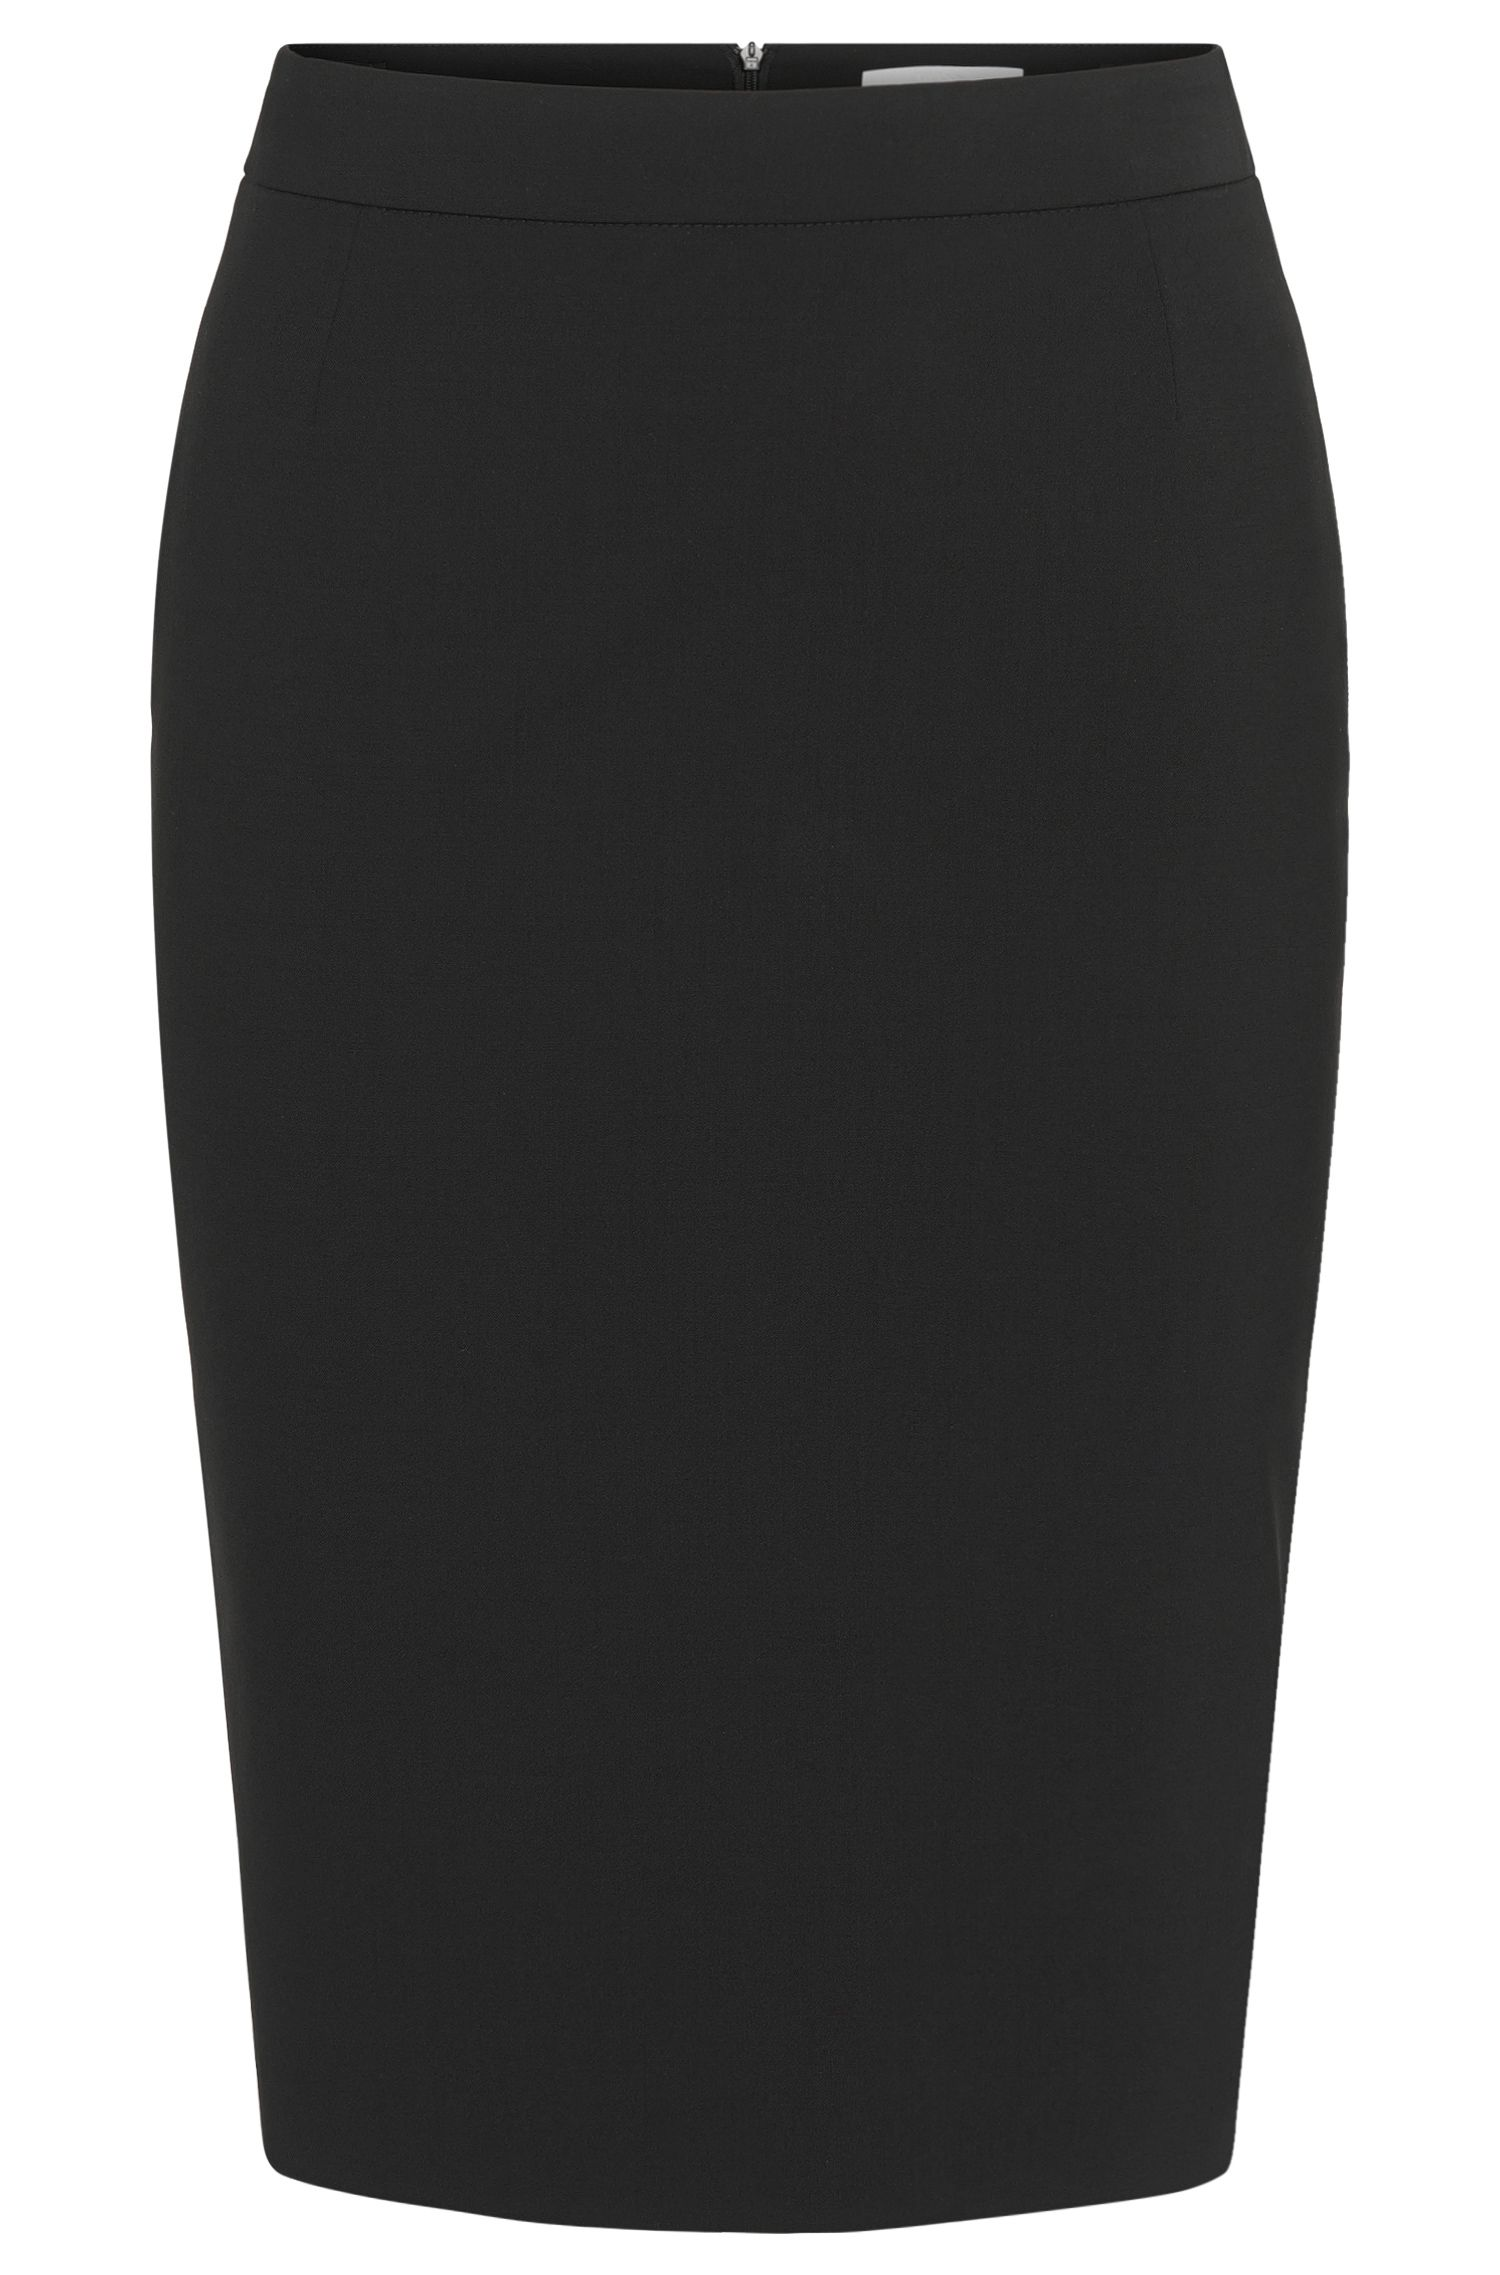 Stretch Virgin Wool Pencil Skirt | Vilea